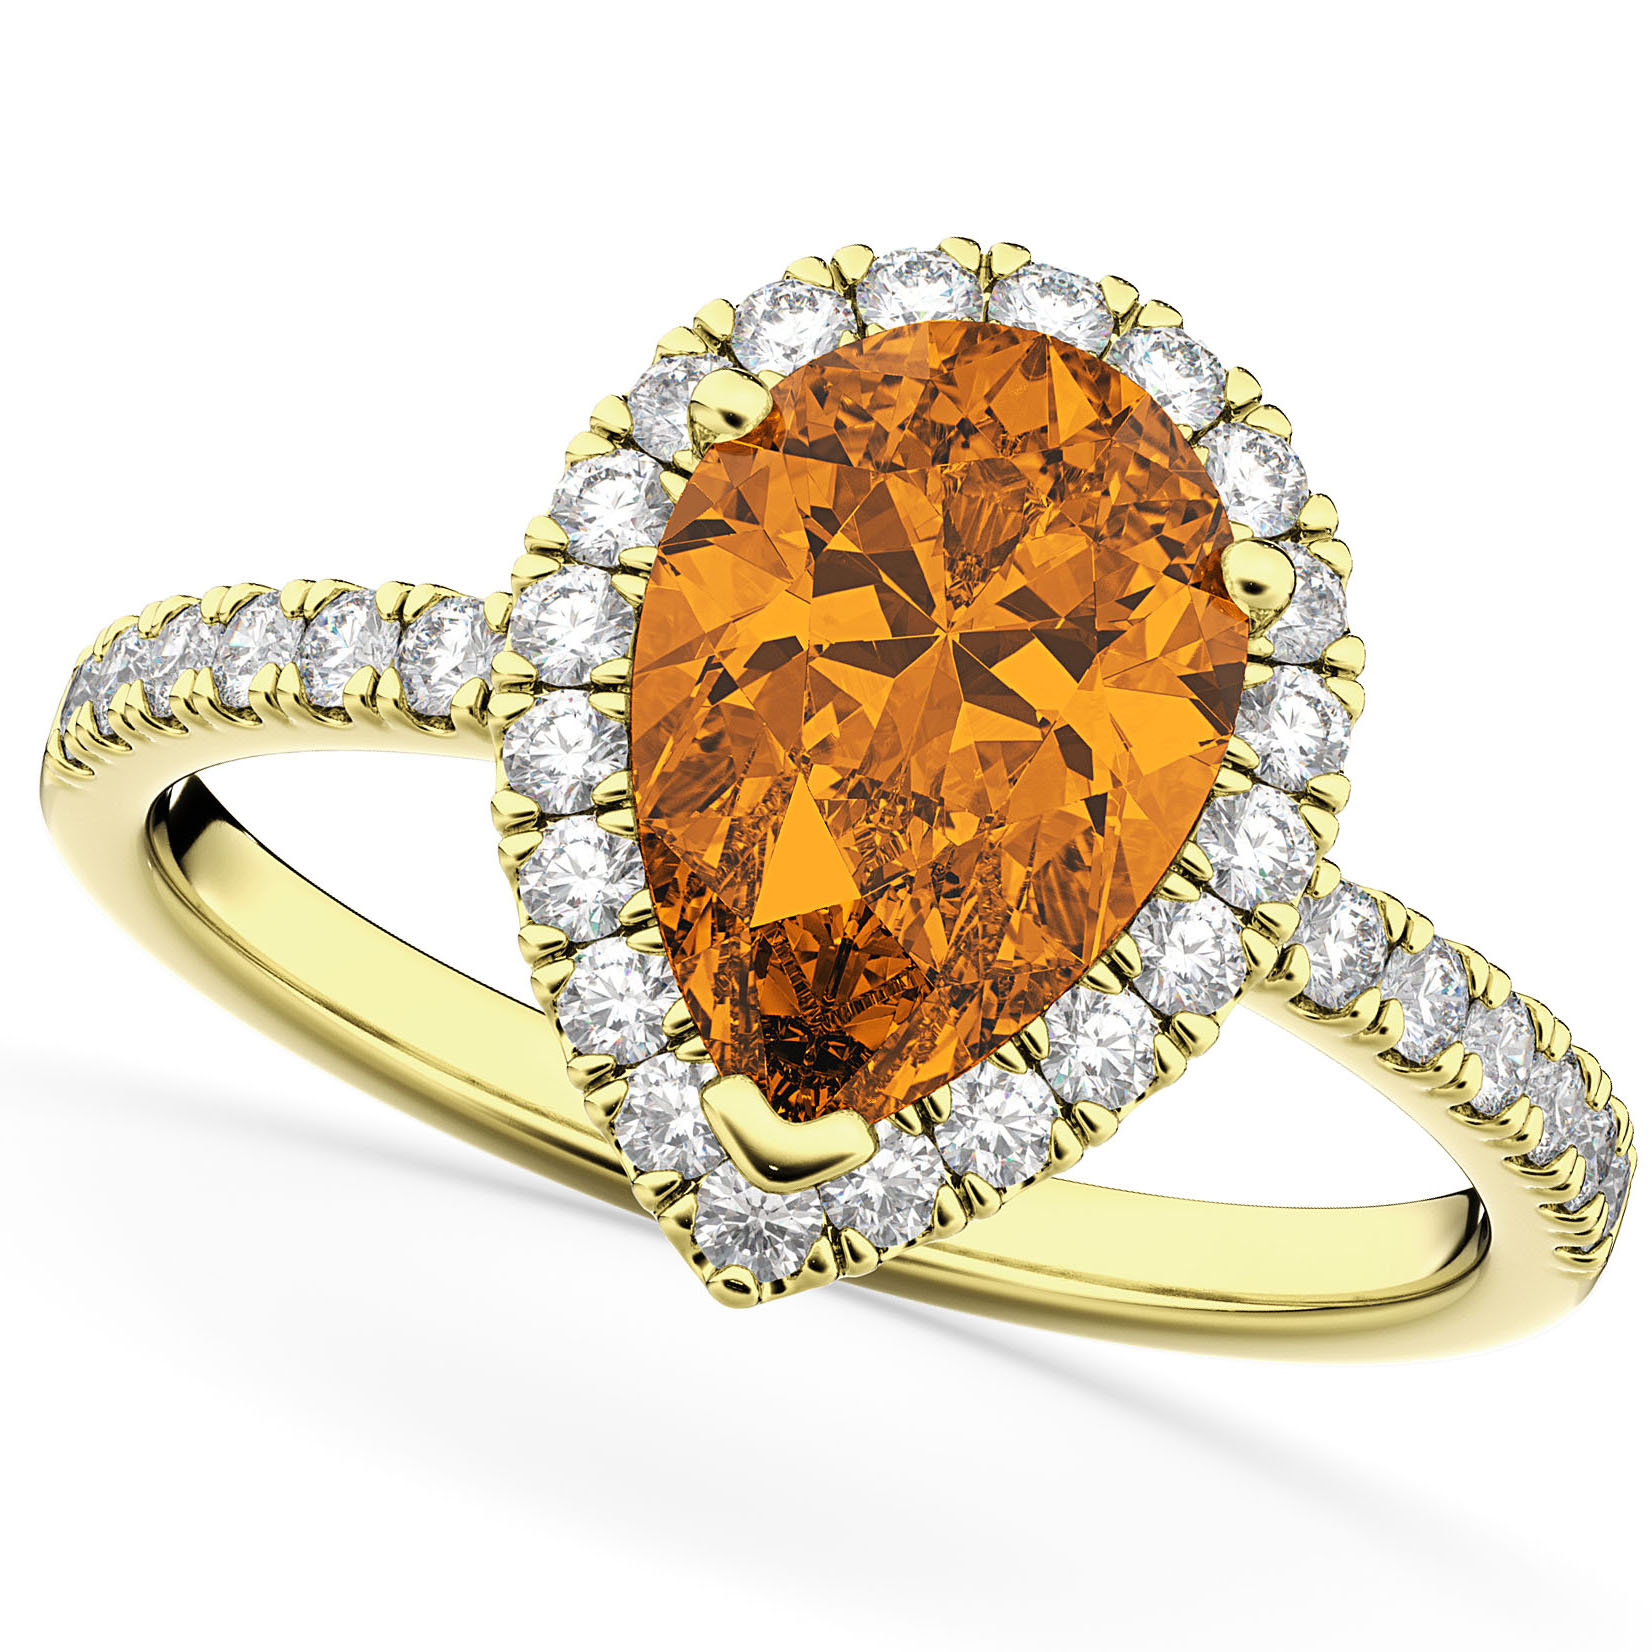 Pear Cut Halo Citrine & Diamond Engagement Ring 14K Yellow Gold 2.21ct